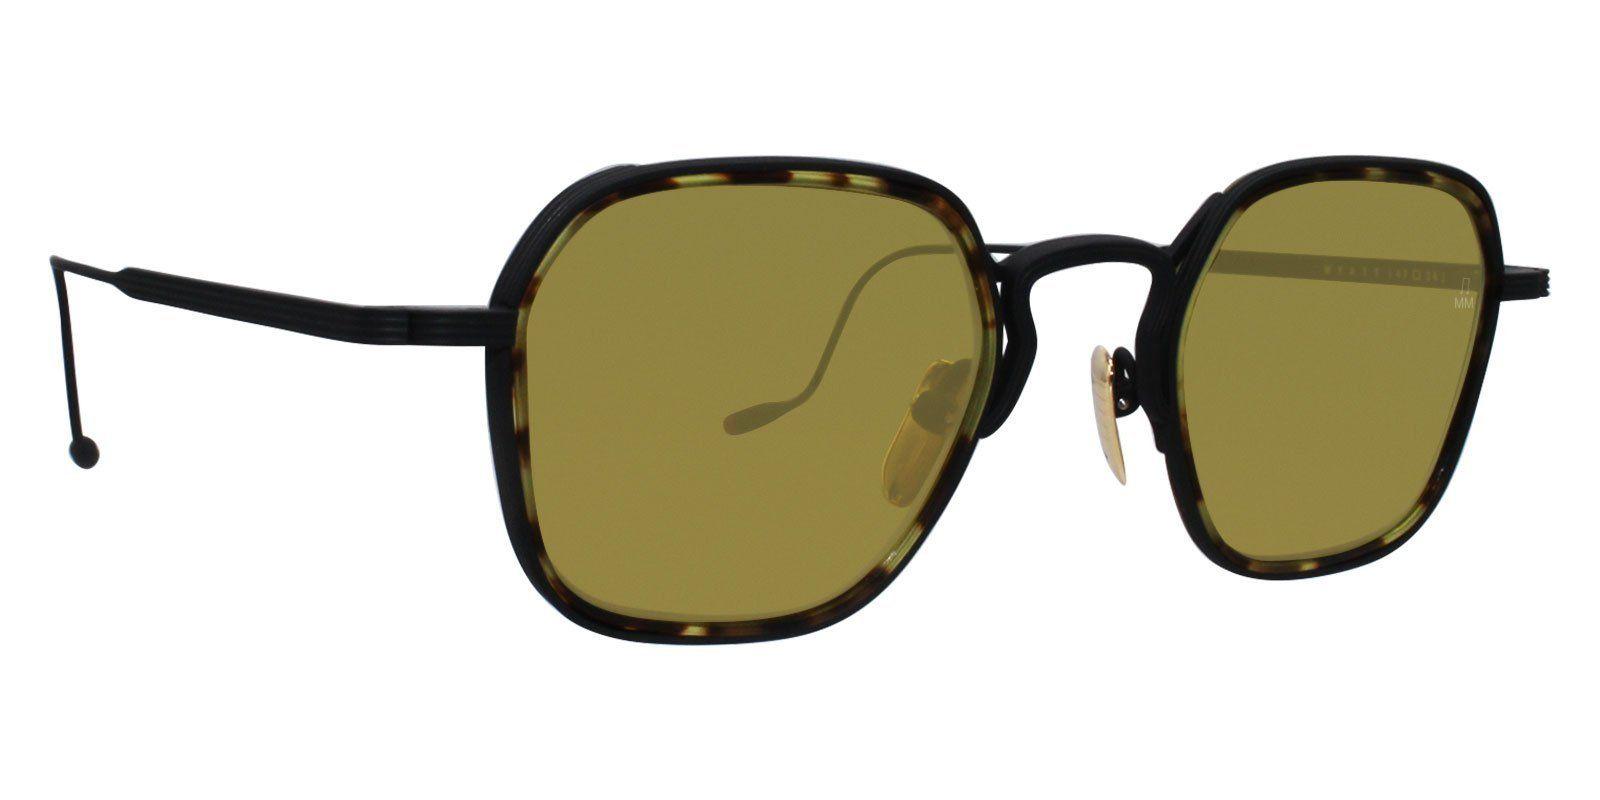 f8987335517 Jacques Marie Mage - Wyatt Gold - Yellow-sunglasses-Designer Eyes ...